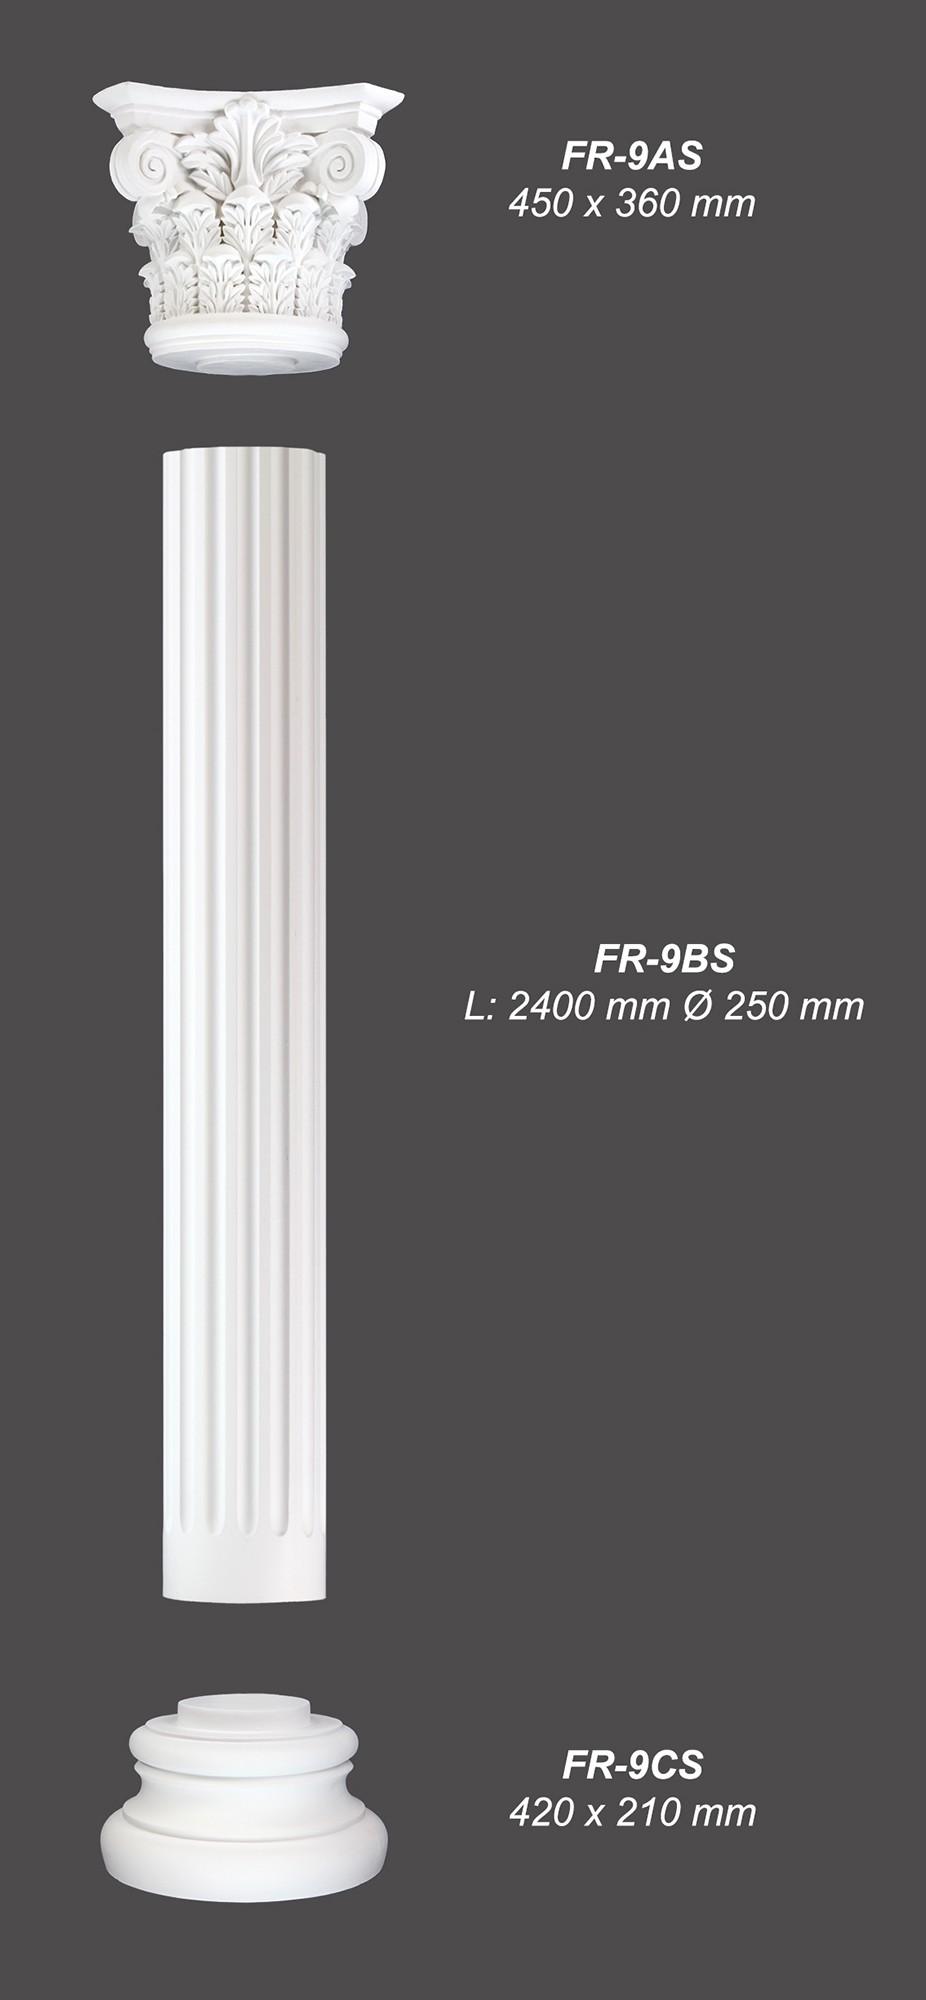 2 4 meter pu s ule rund kanneliert k rper stuck dekor sto fest 250mm fr 9bs wand s ulen. Black Bedroom Furniture Sets. Home Design Ideas